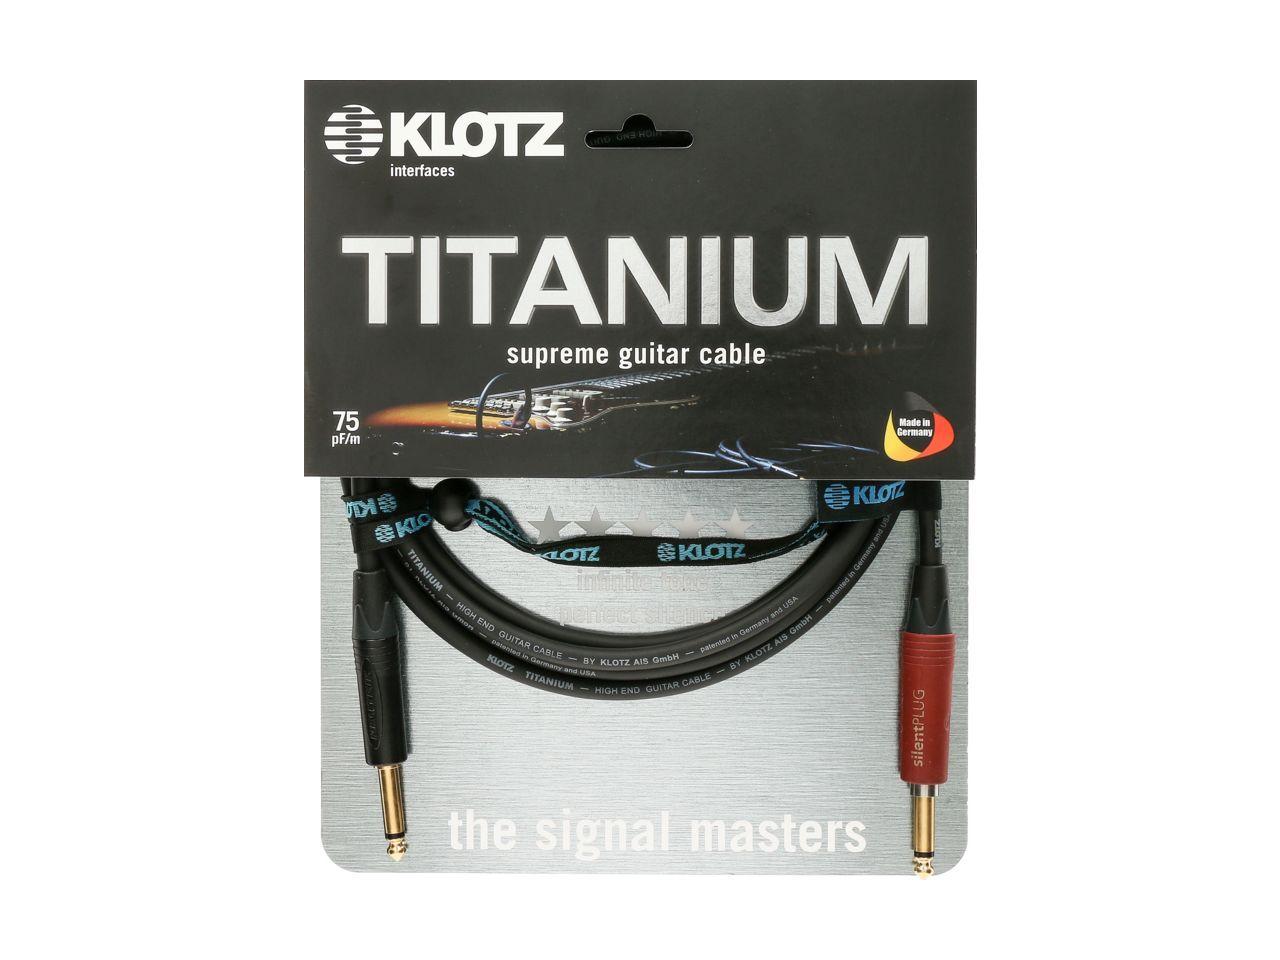 Klotz Titanium Supreme Gitarrenkabel mit Silent Plug gerade 3m